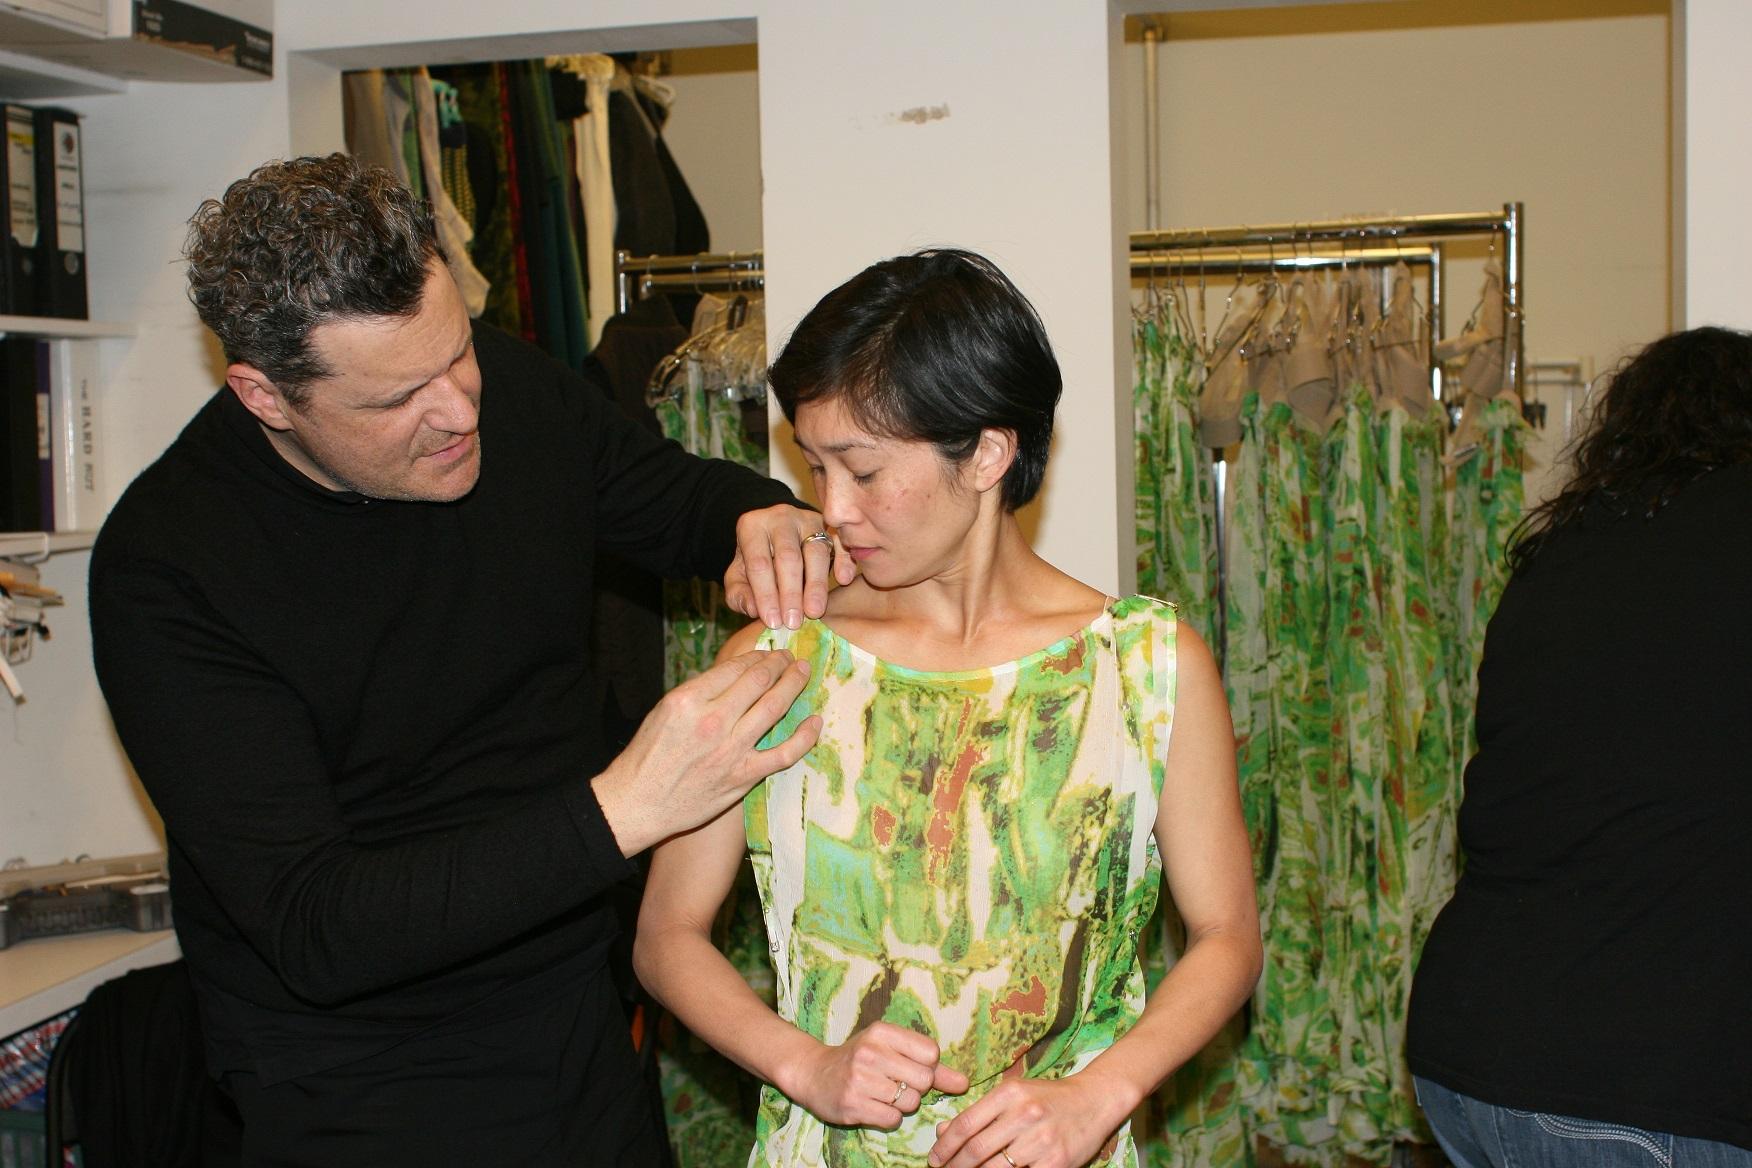 Mizrahi and Okamura